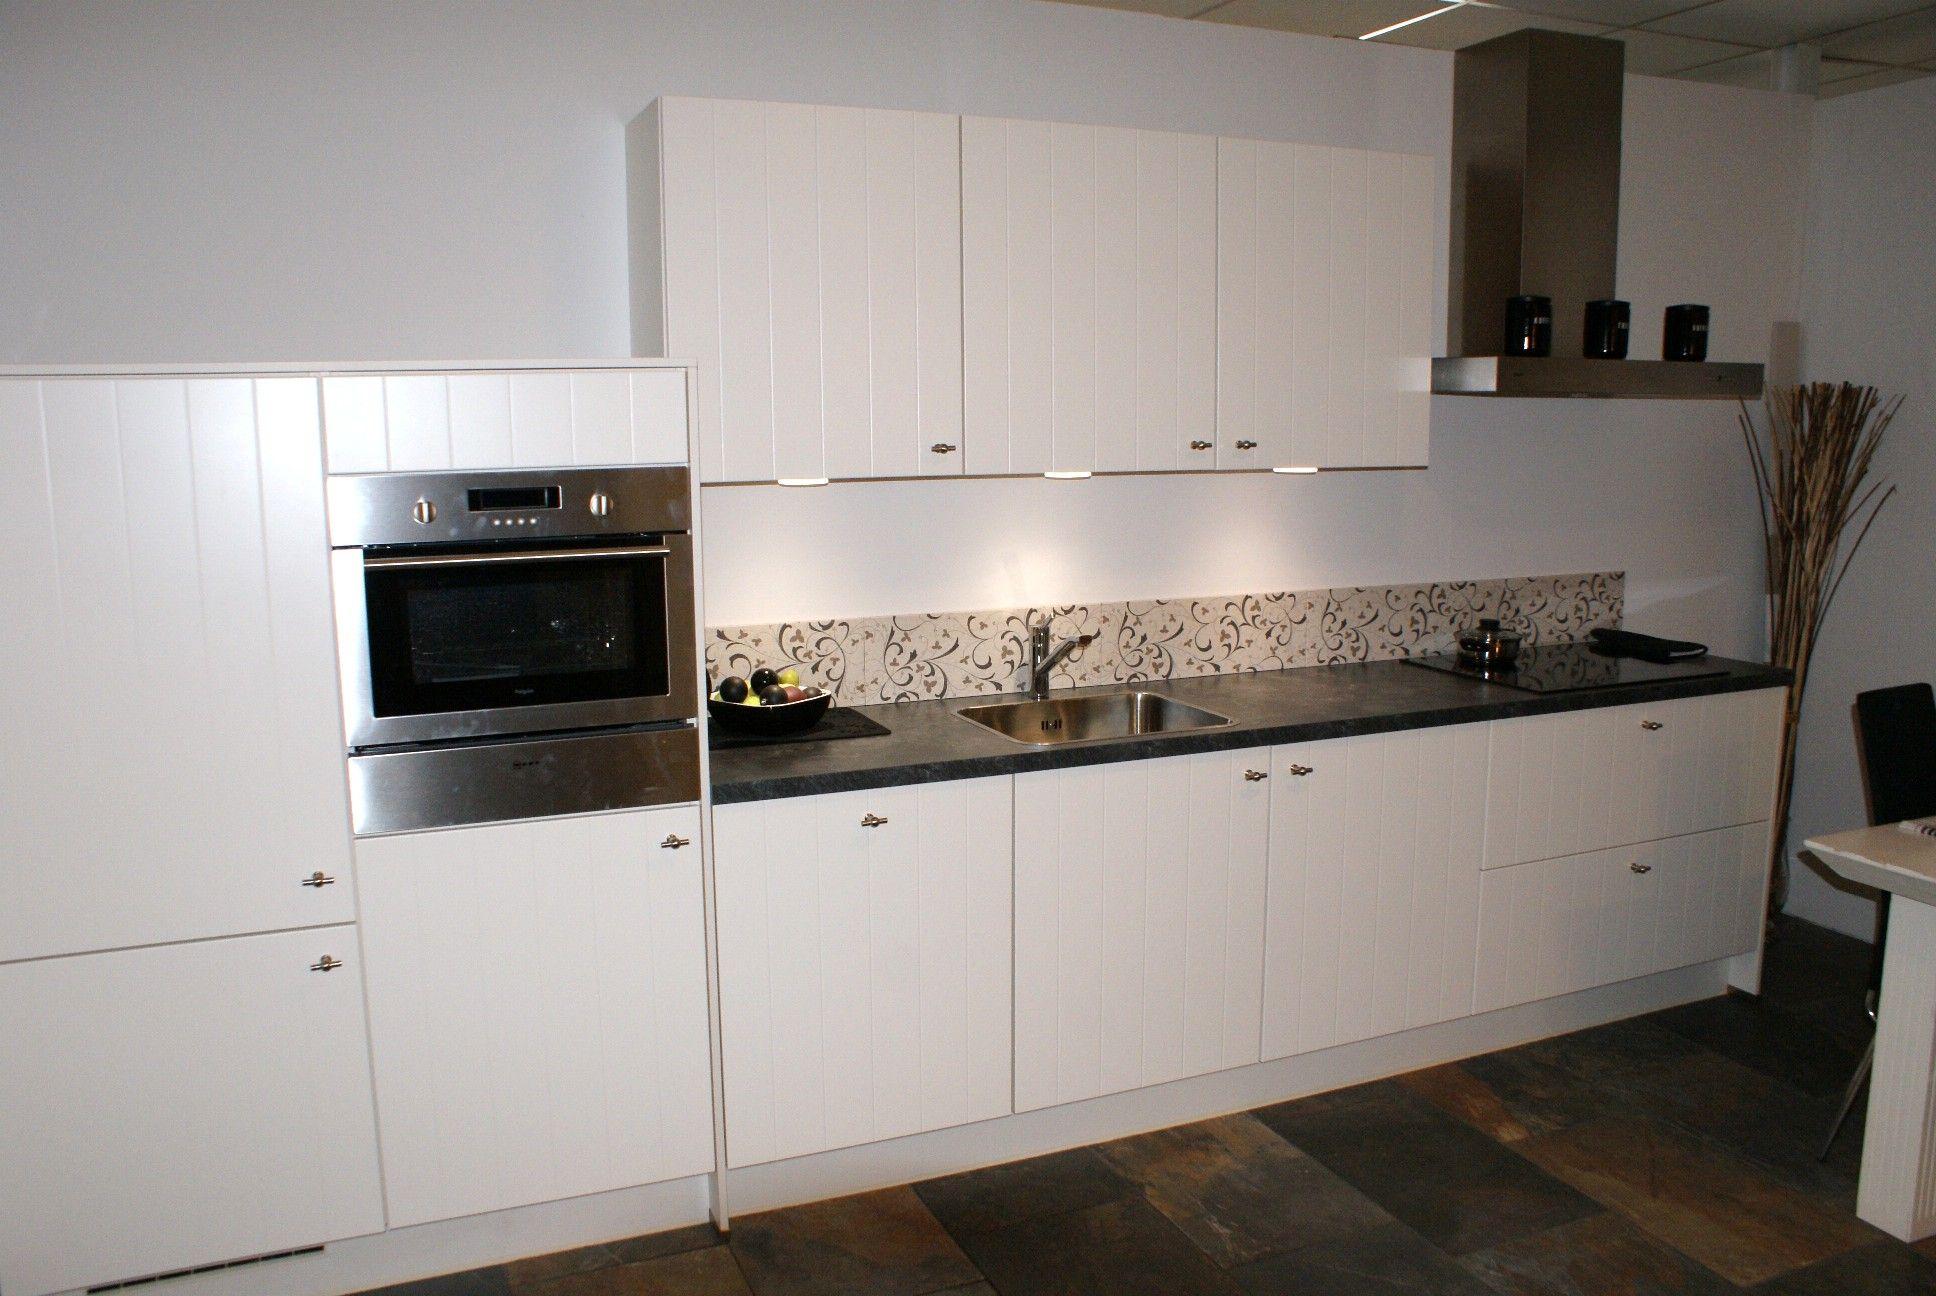 Keuken Kleur Magnolia : keukensite van Nederland Vivari magnolia rechte keuken [50088